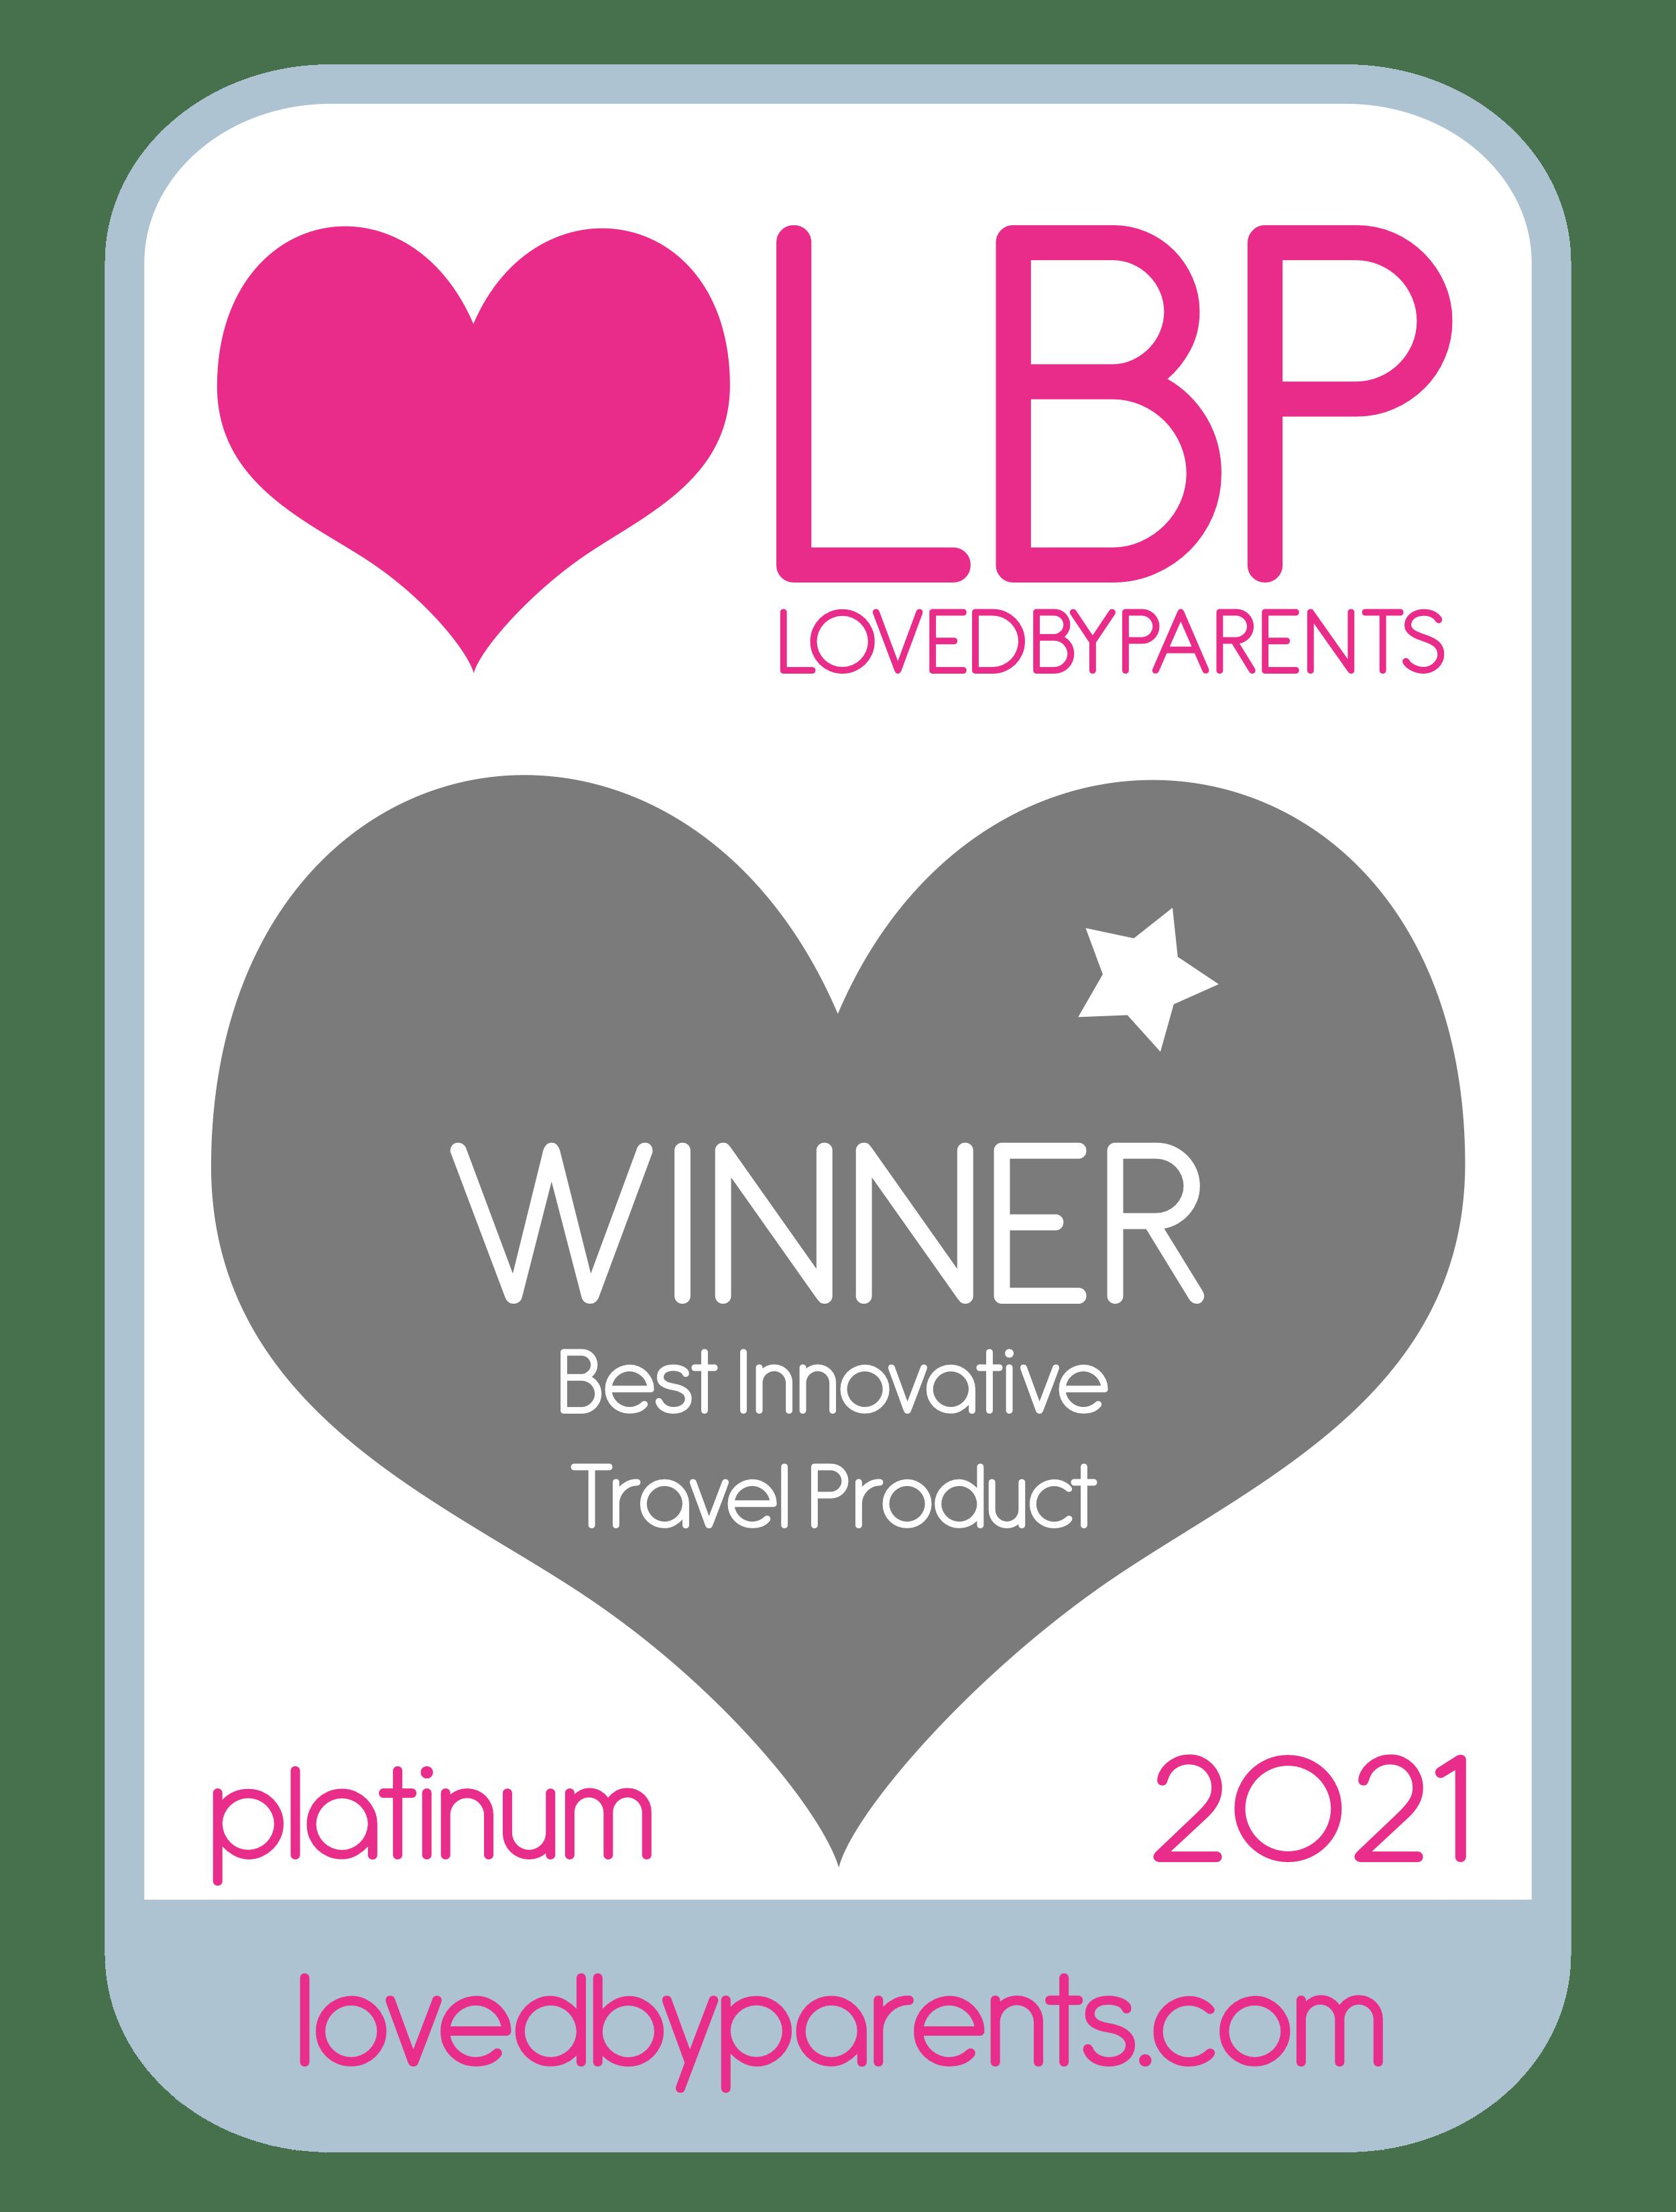 Best Innovative Travel Product 2021 – LBP